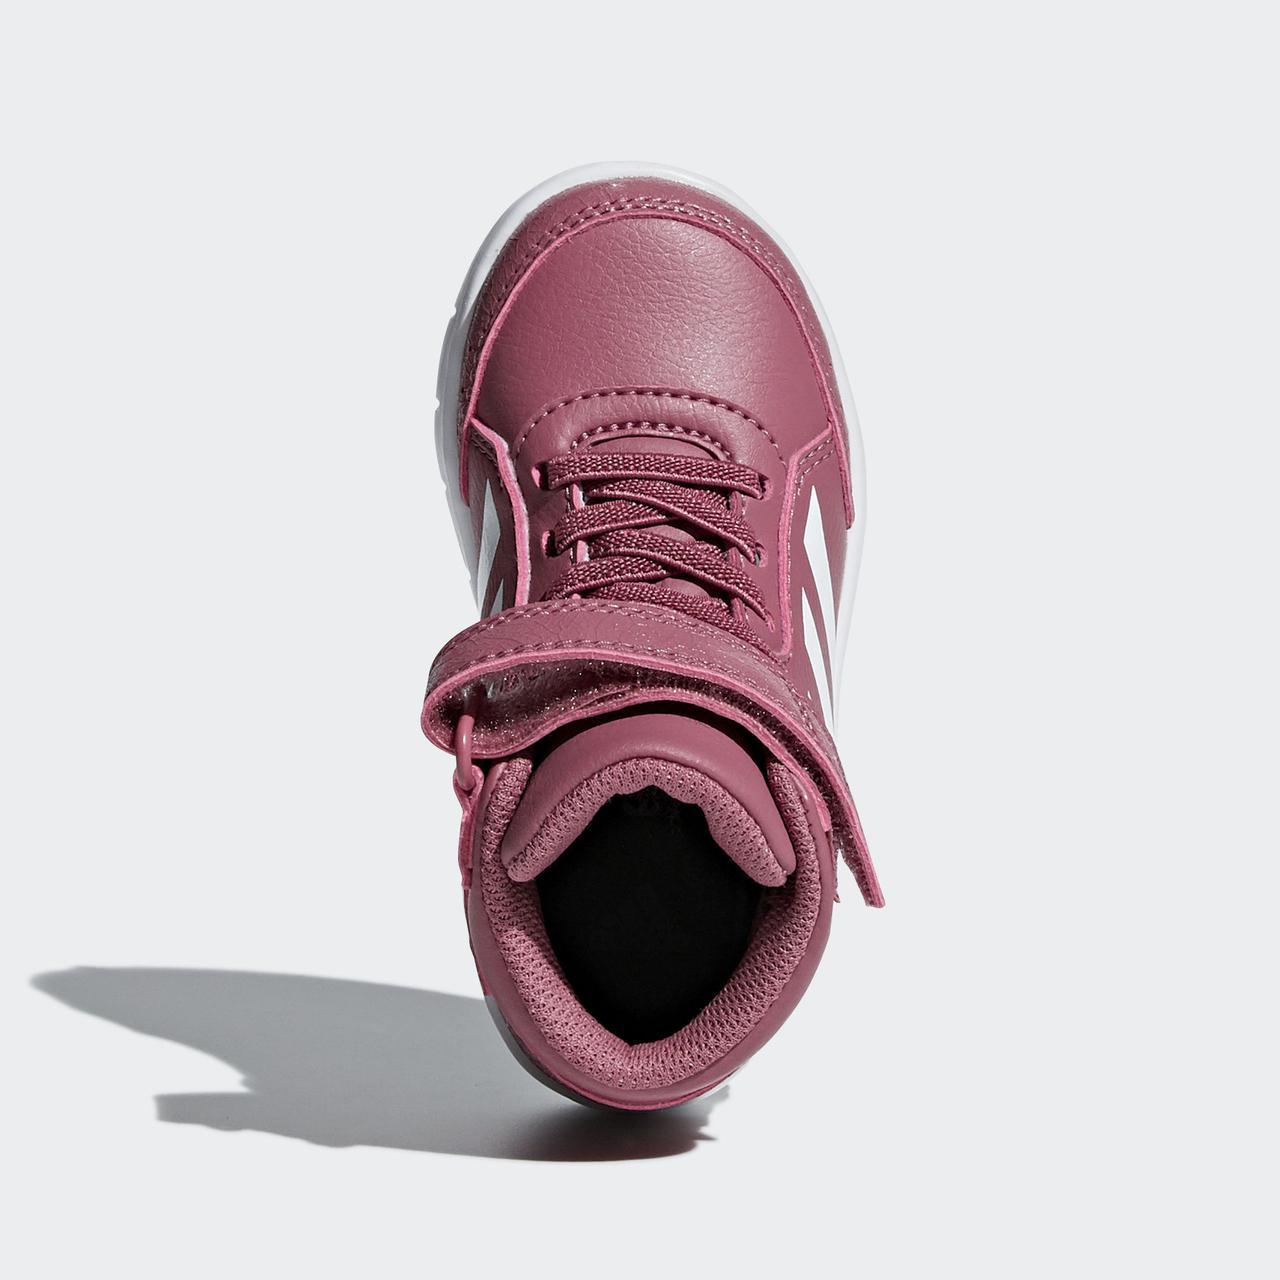 f28ebec9aa15 Детские кроссовки Adidas Performance Altasport Mid (Артикул  AH2551), ...